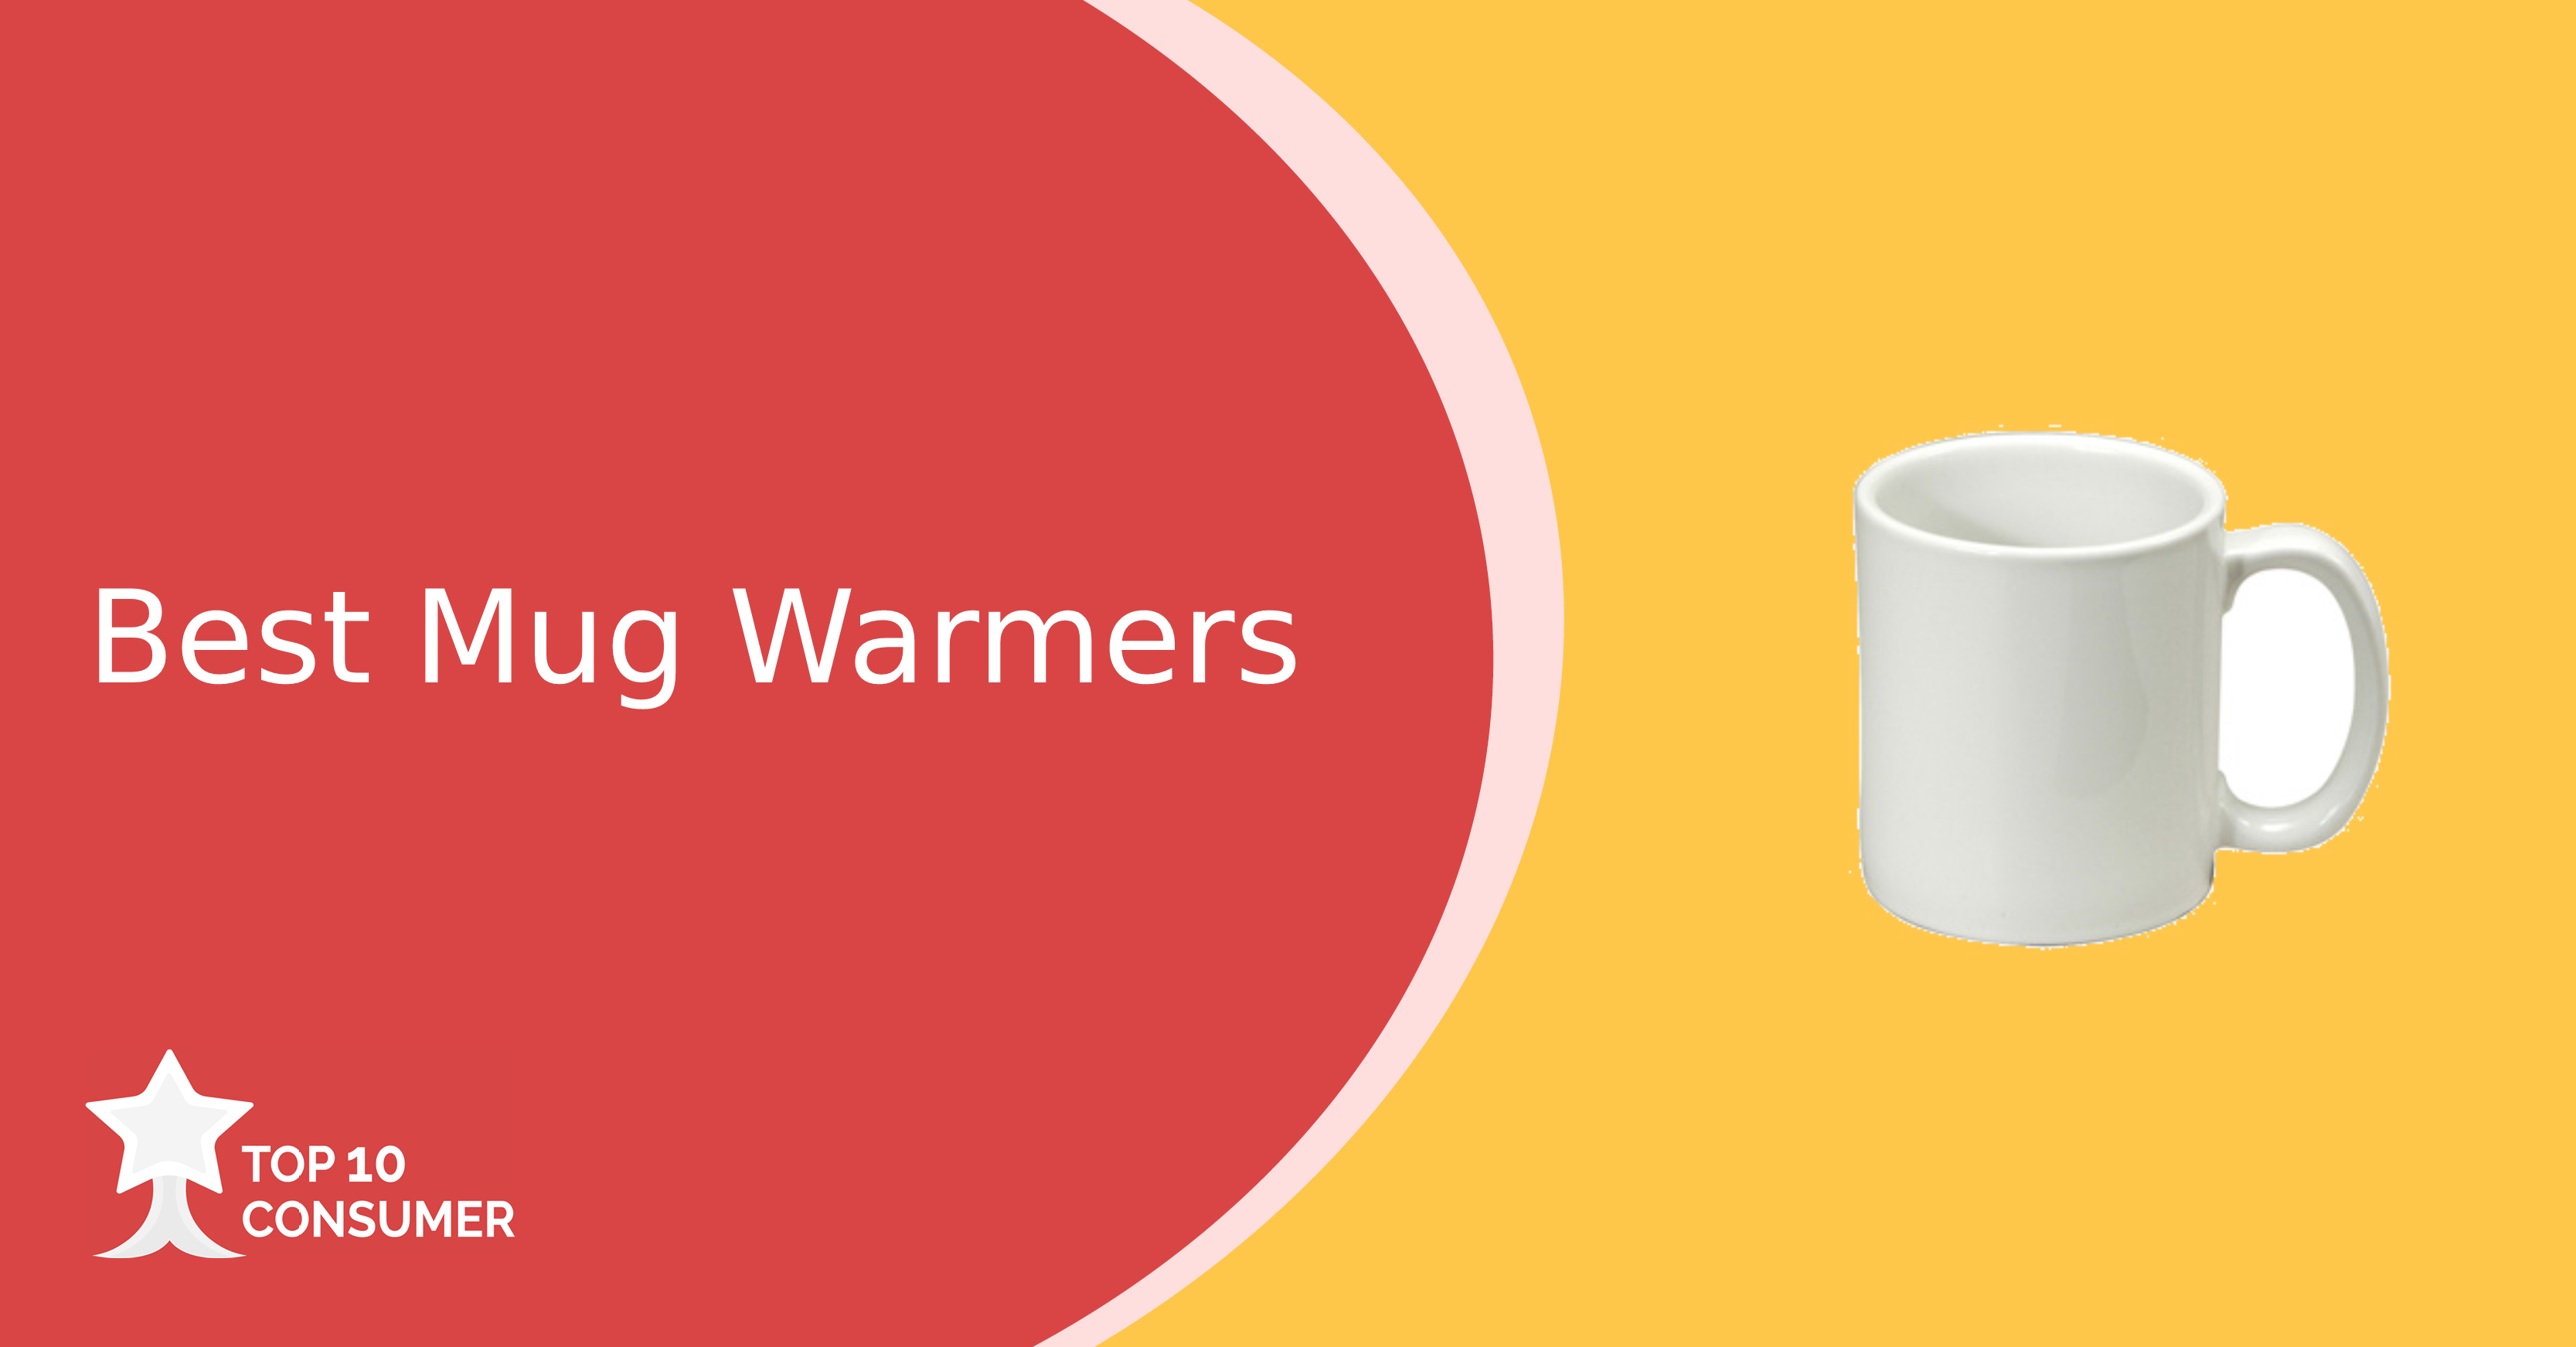 Best Mug Warmers